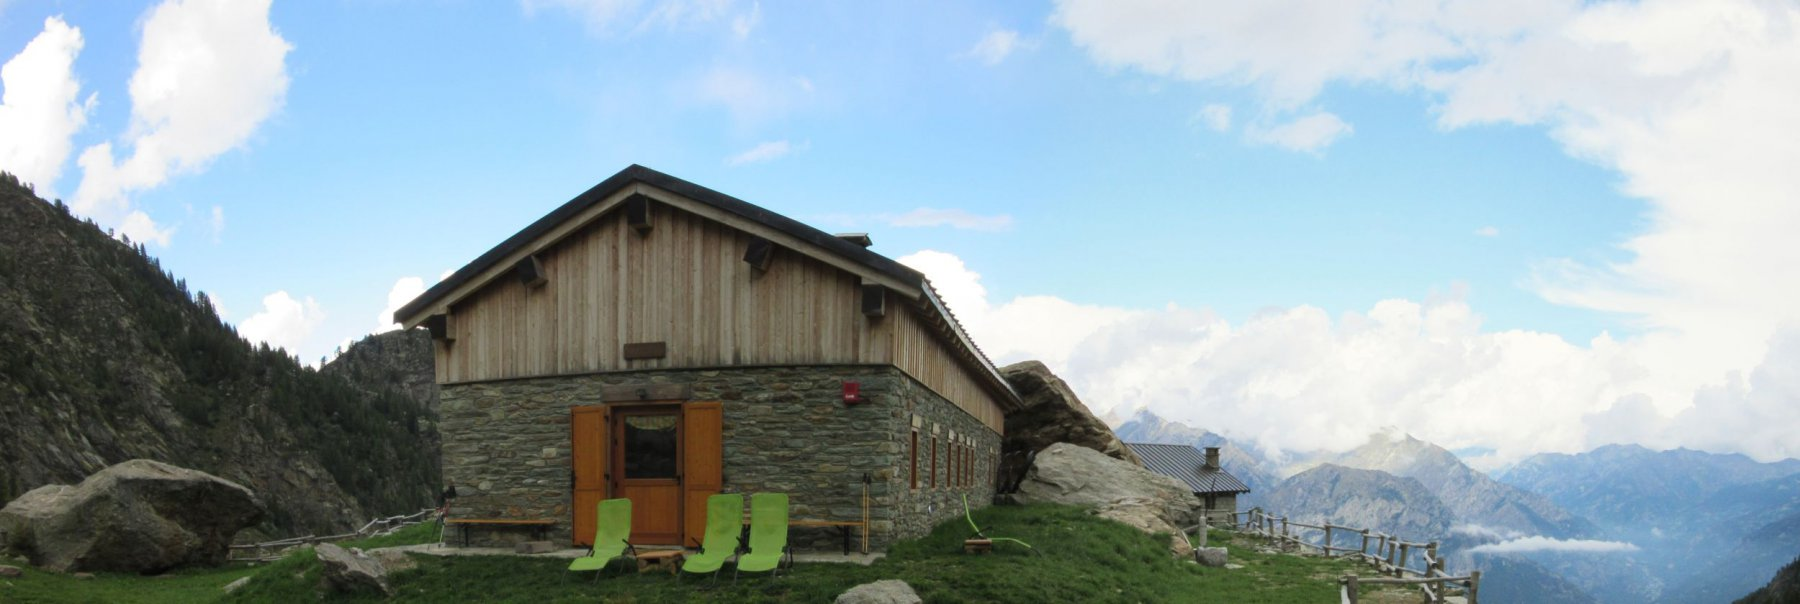 Rifugio Alpe Bonze